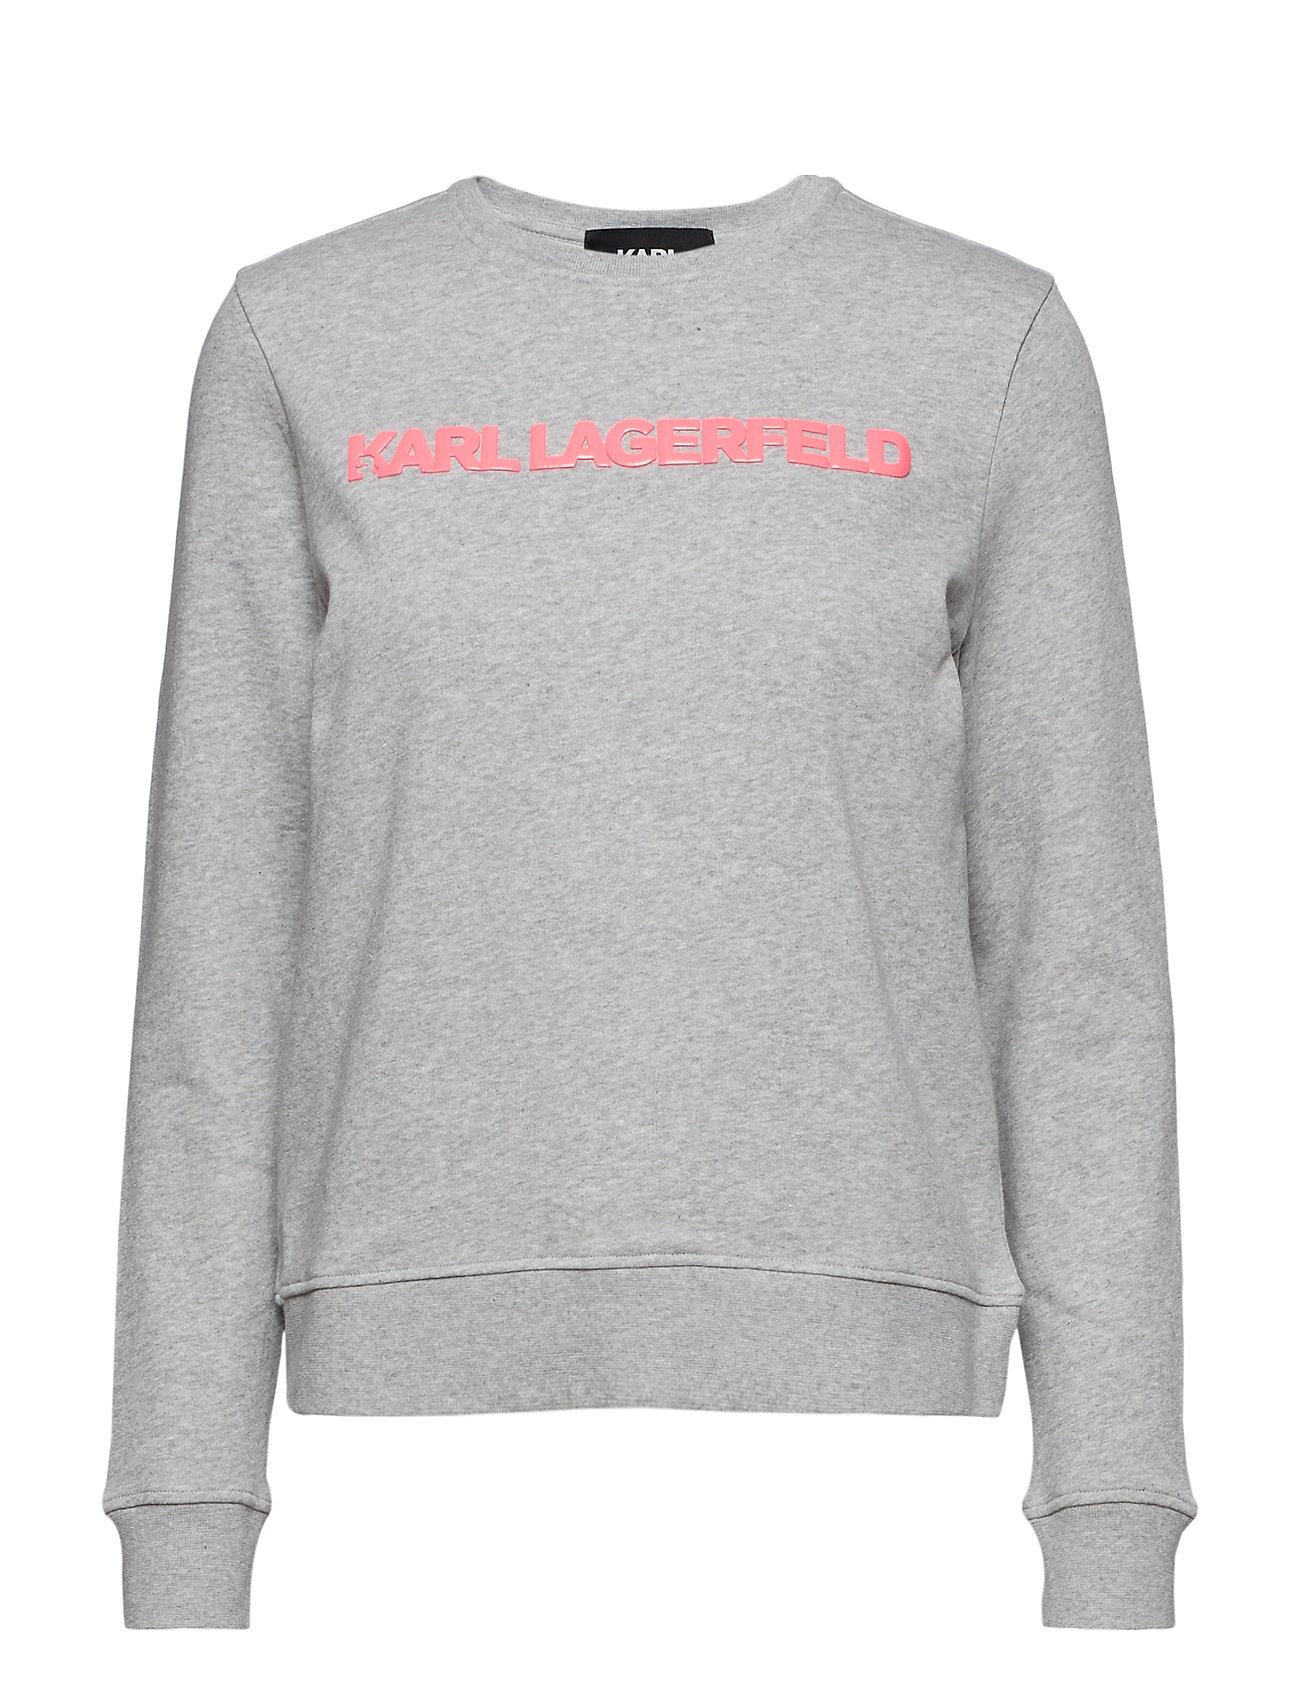 Karl Lagerfeld Neon Lights Logo Sweatshirt